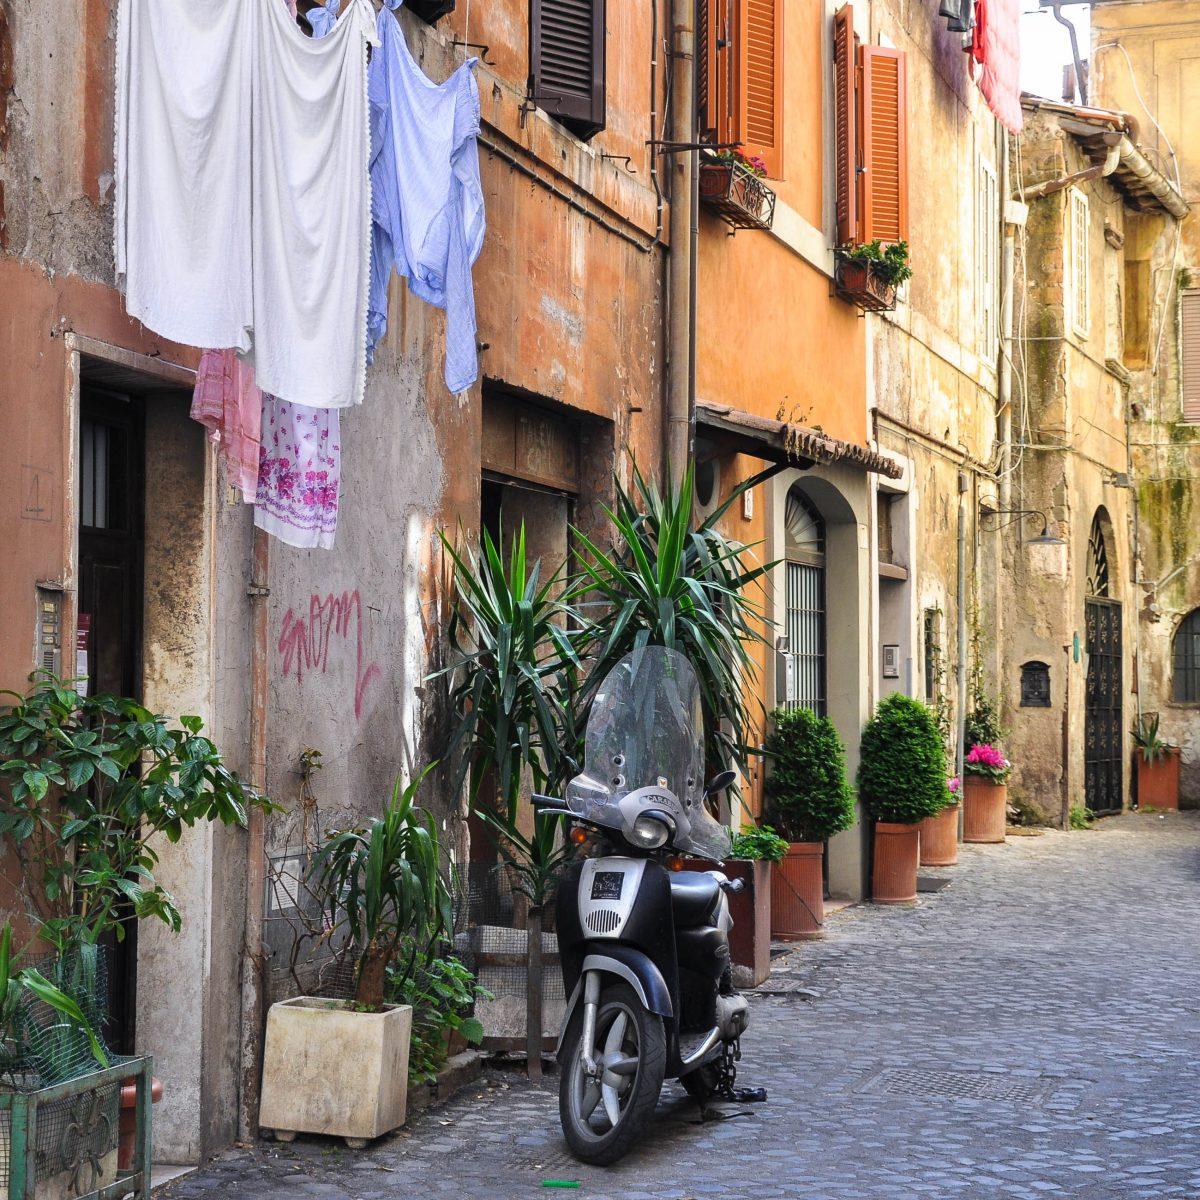 Typische Straßenszenerie im Stadtviertel Trastevere in Rom, Italien - © AMB / Shutterstock